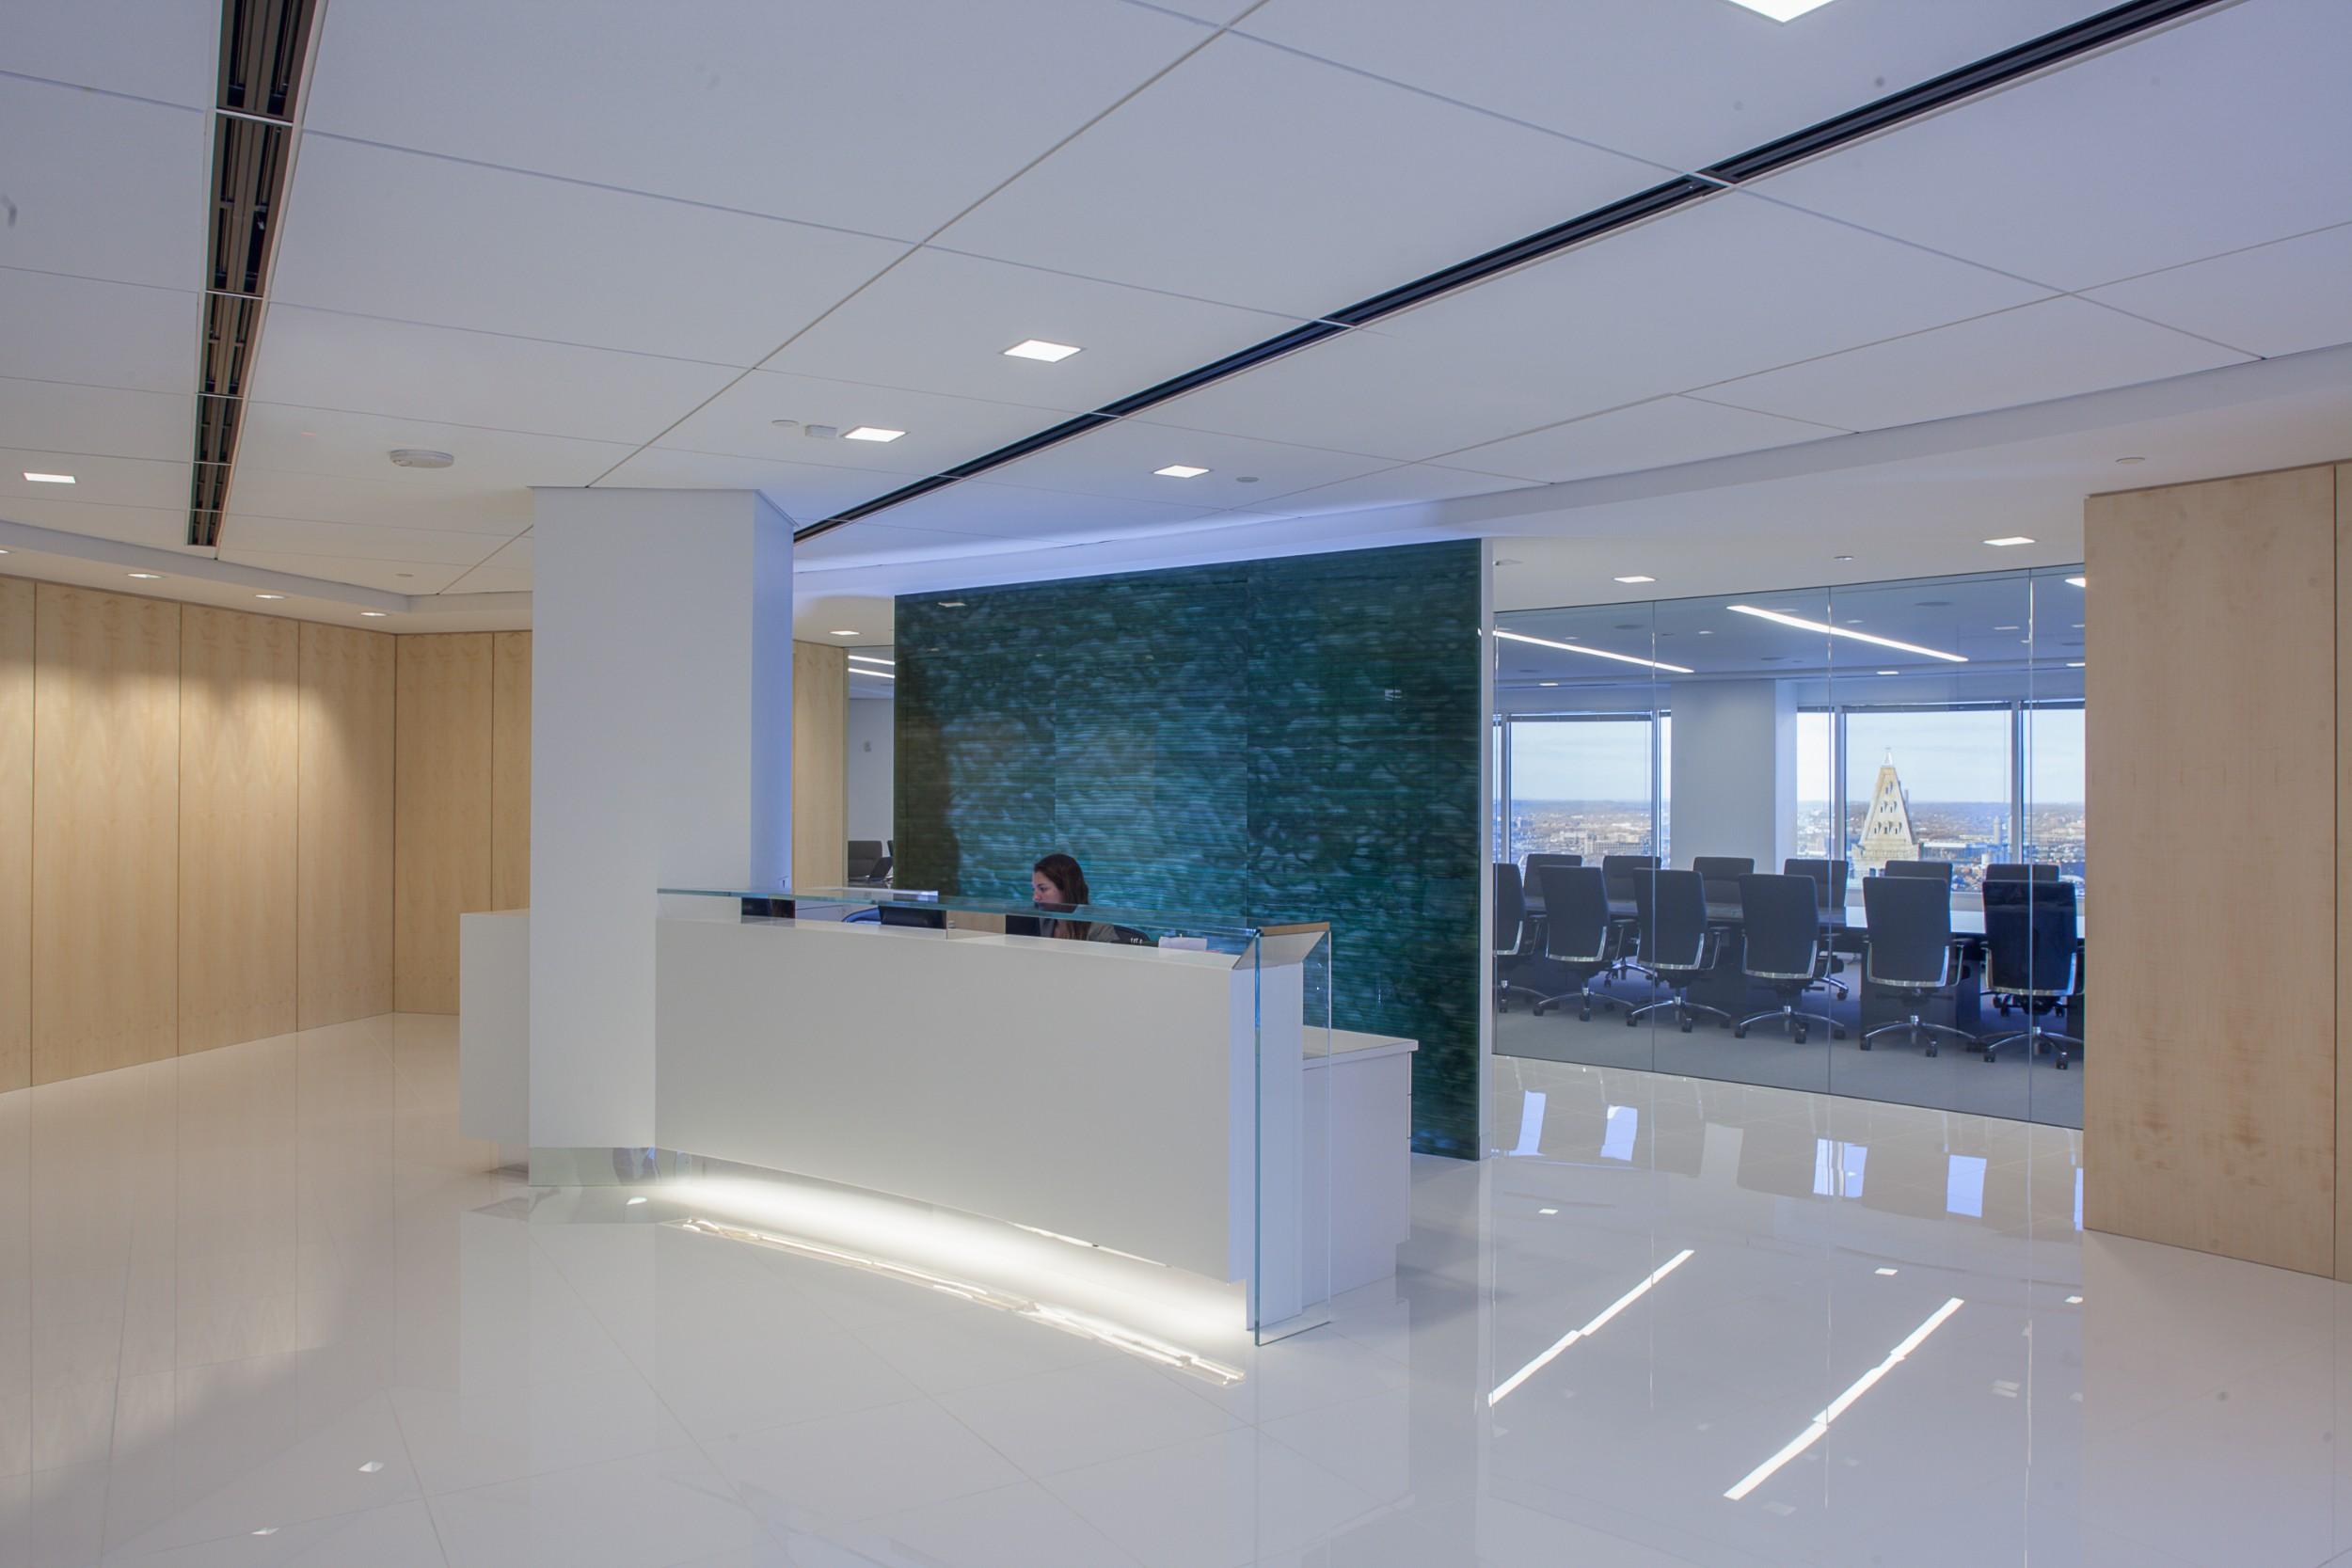 Corderman_Confidential_Reception_Construction_Boston.jpg